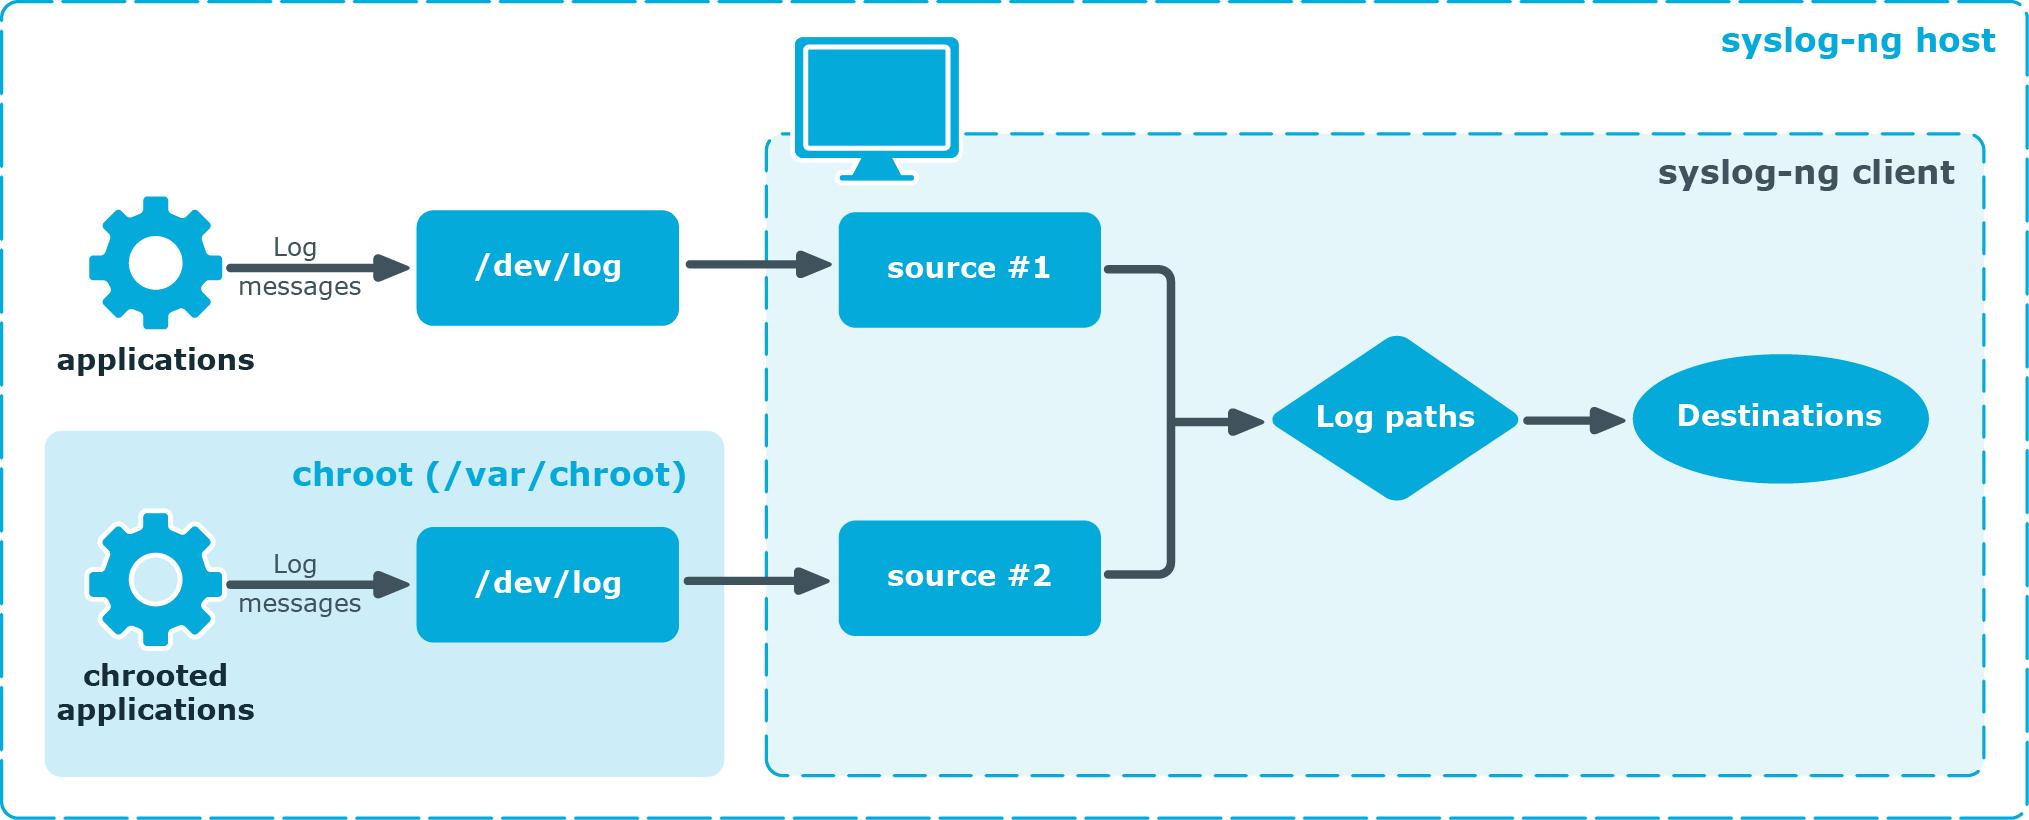 syslog-ng Premium Edition 7 0 9 - Administration Guide